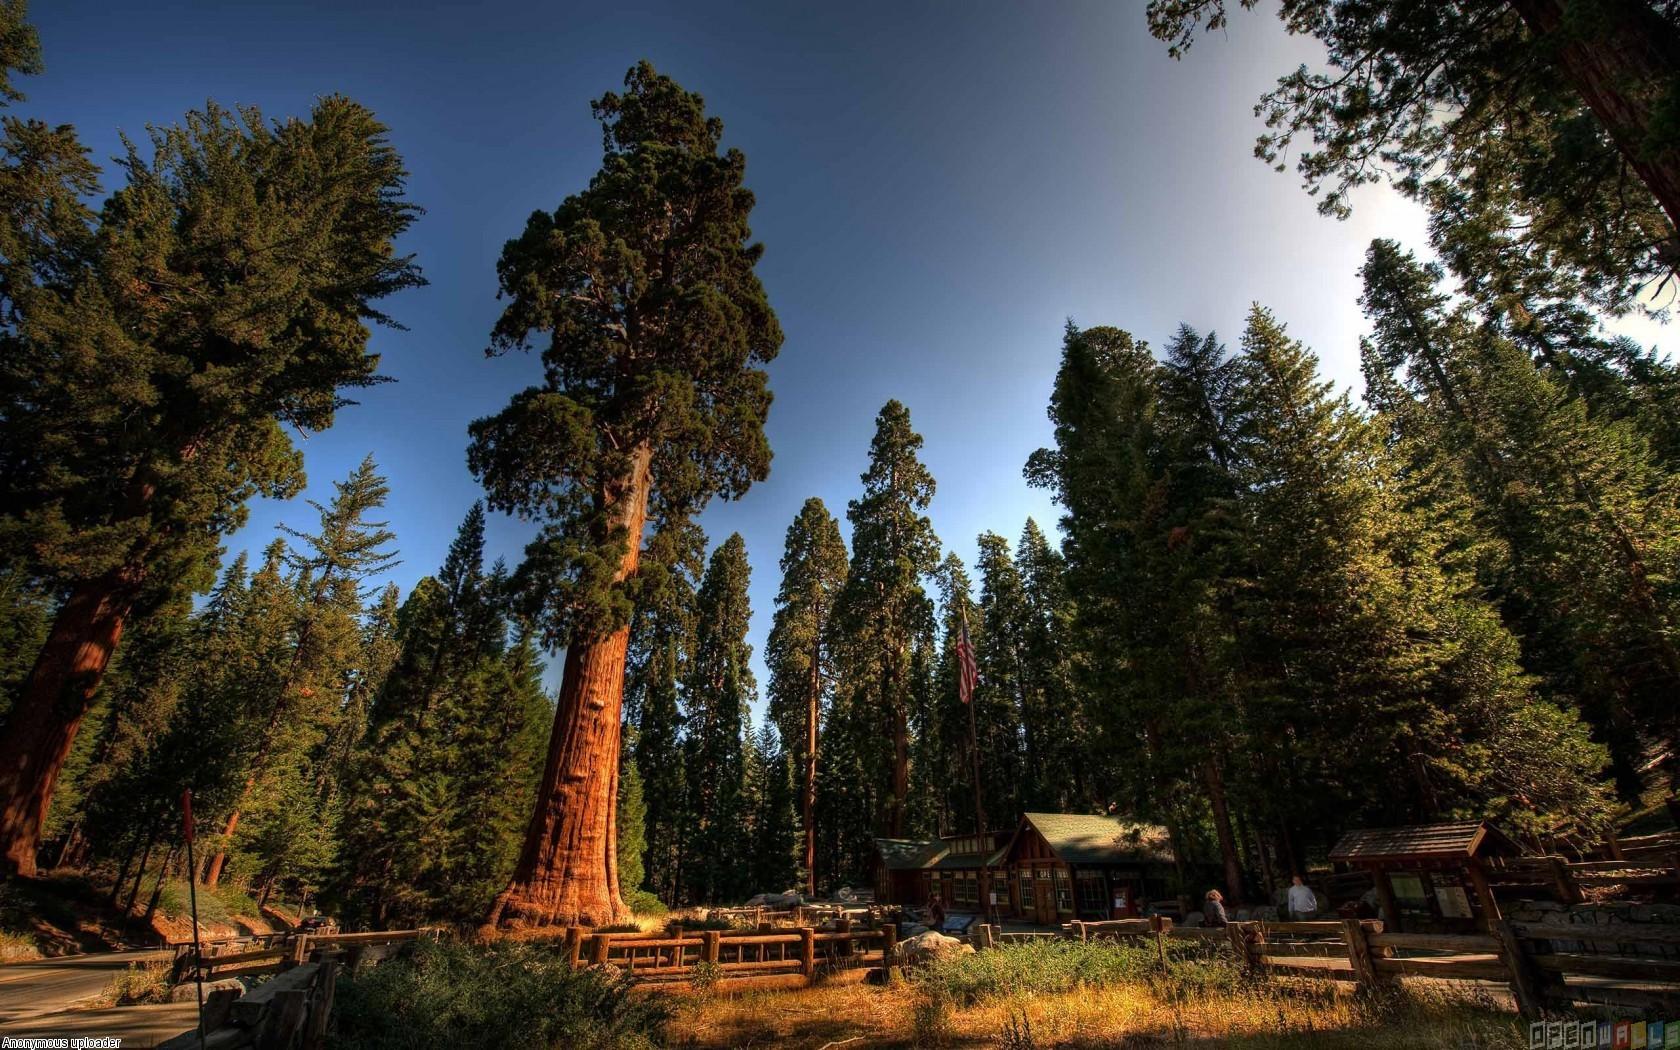 Sequoia national park wallpaper 21462   Open Walls 1680x1050